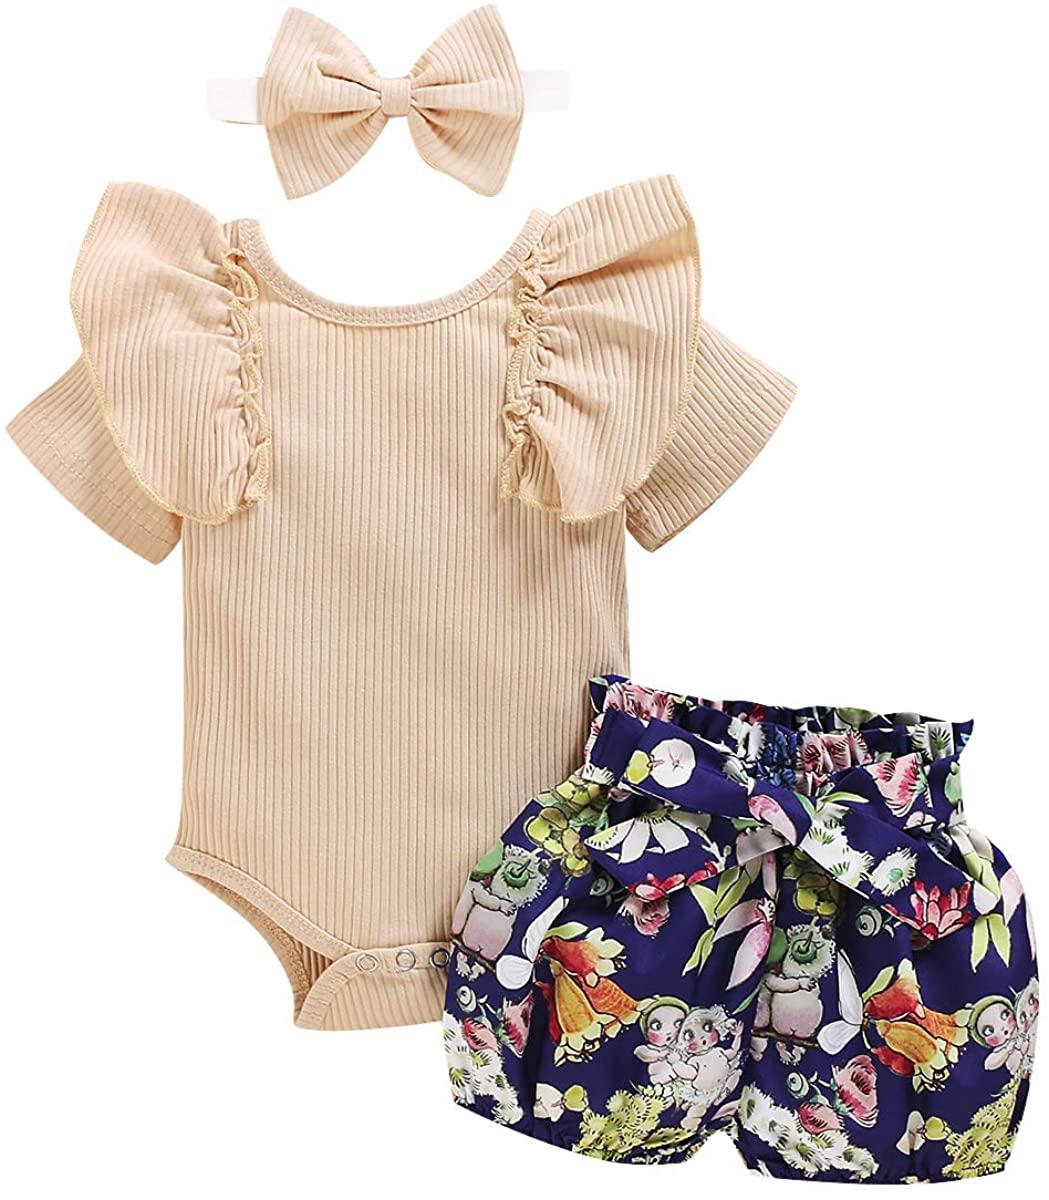 3 PCS Newborn Baby Girl[s Floral Clothes Short Sleeve Romper Jumpsuit+Sunflower Print Tutu Shorts Headband Outfits Set